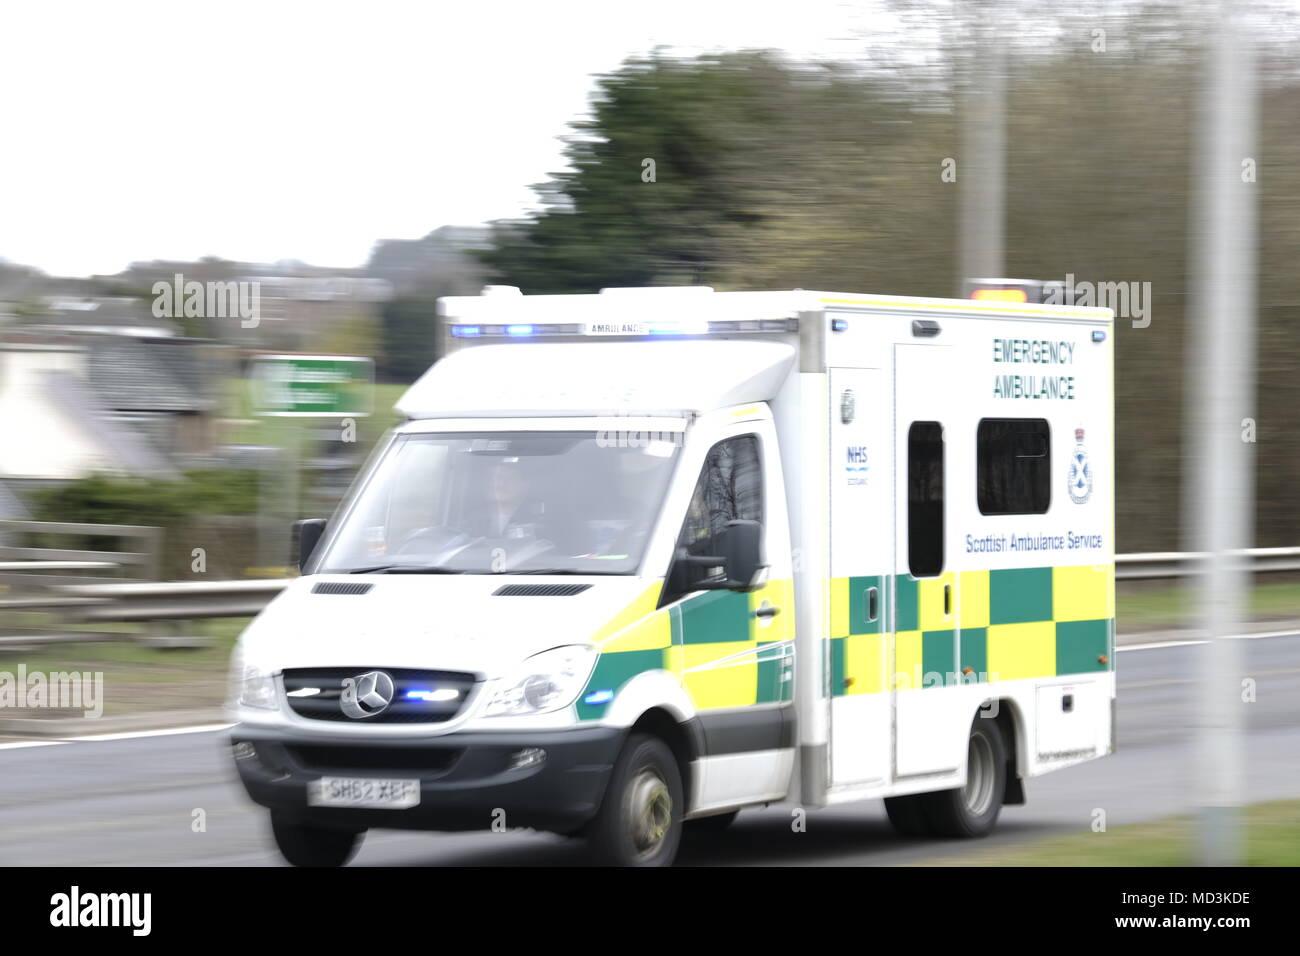 Melrose, Borders General Hospital, UK  18 Apr 2018  [Headline